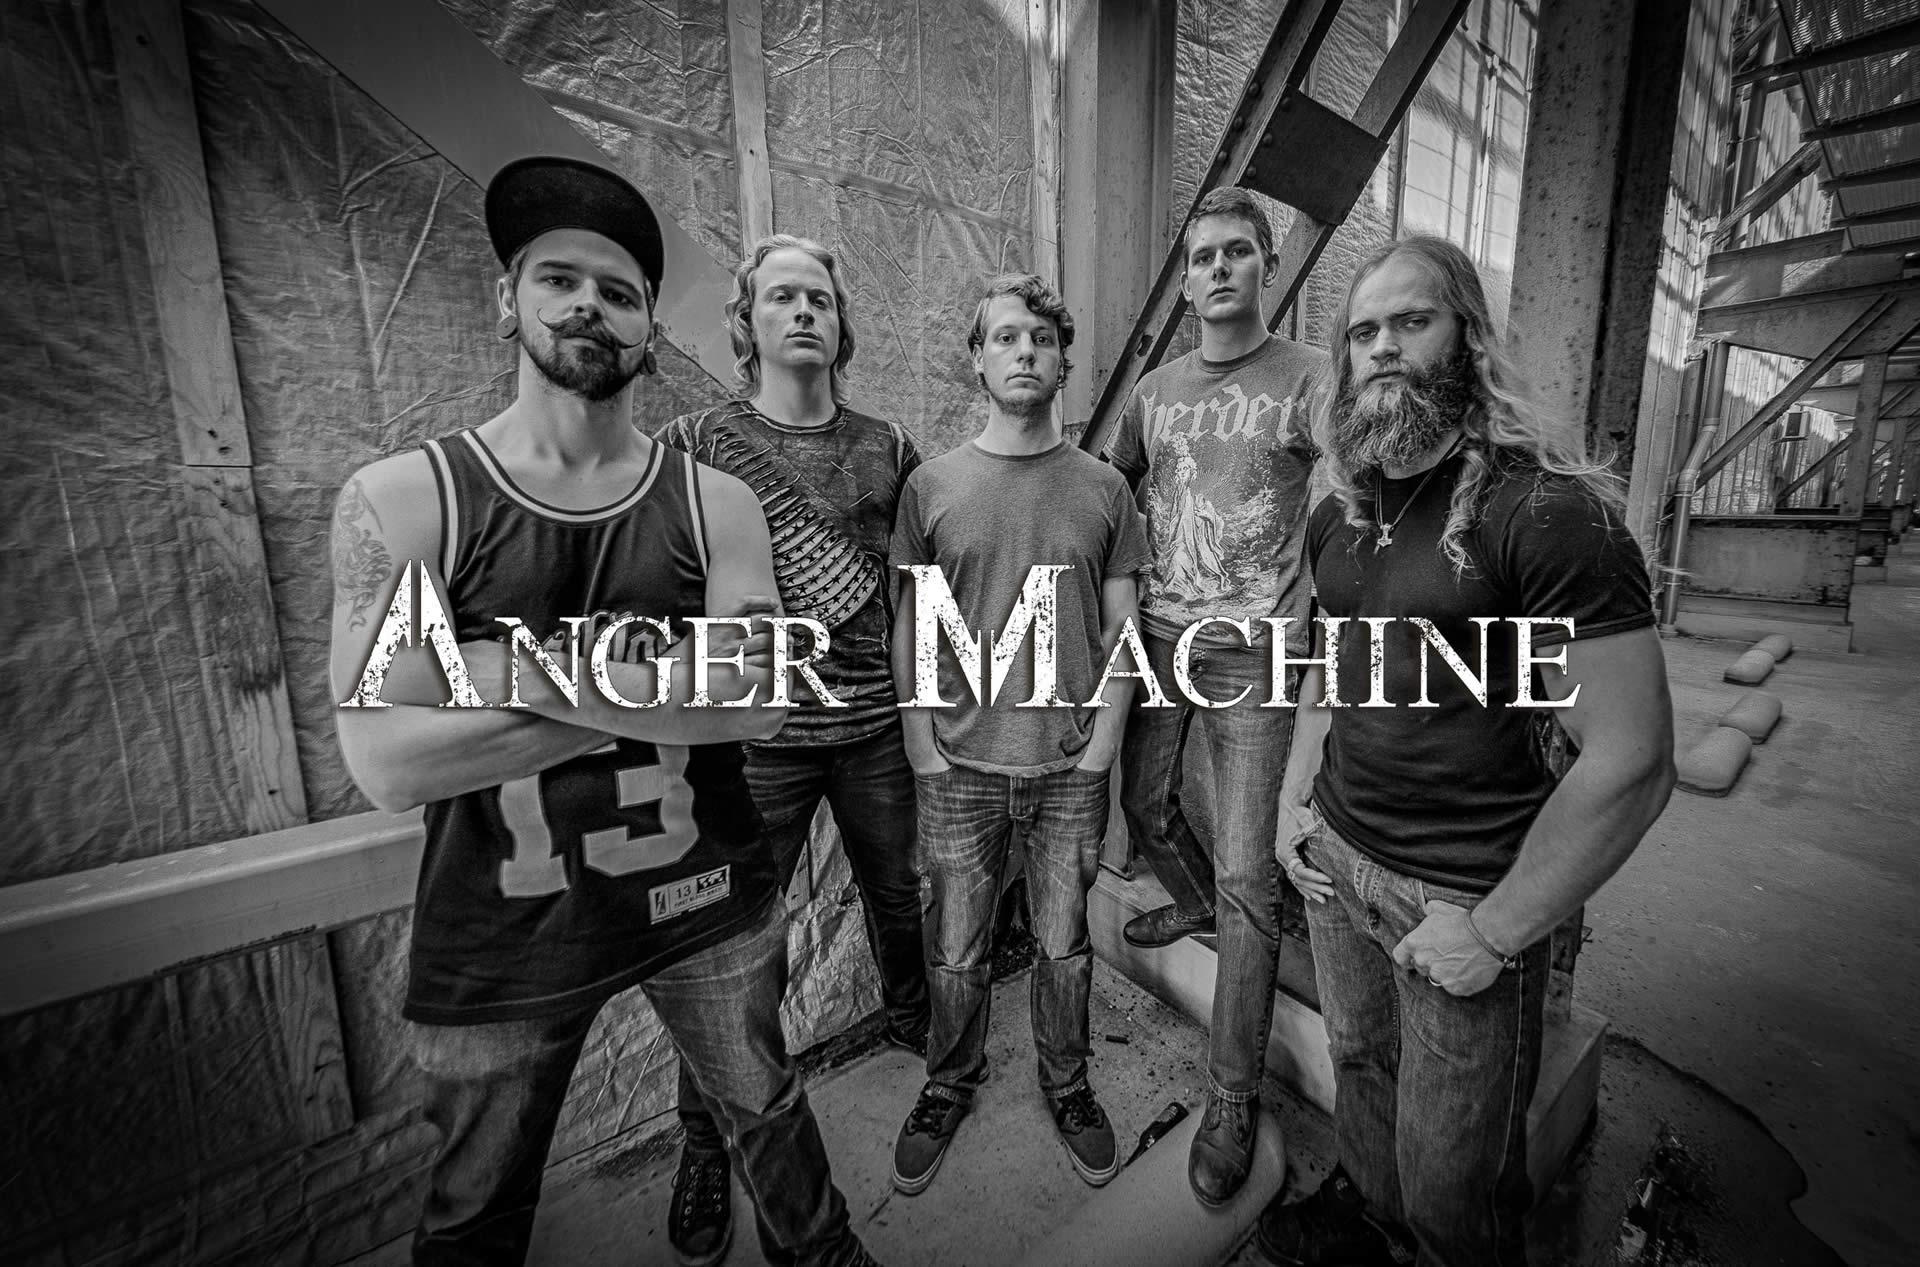 http://www.angermachine.nl/wp-content/uploads/2016/08/slide03-logo-1.jpg